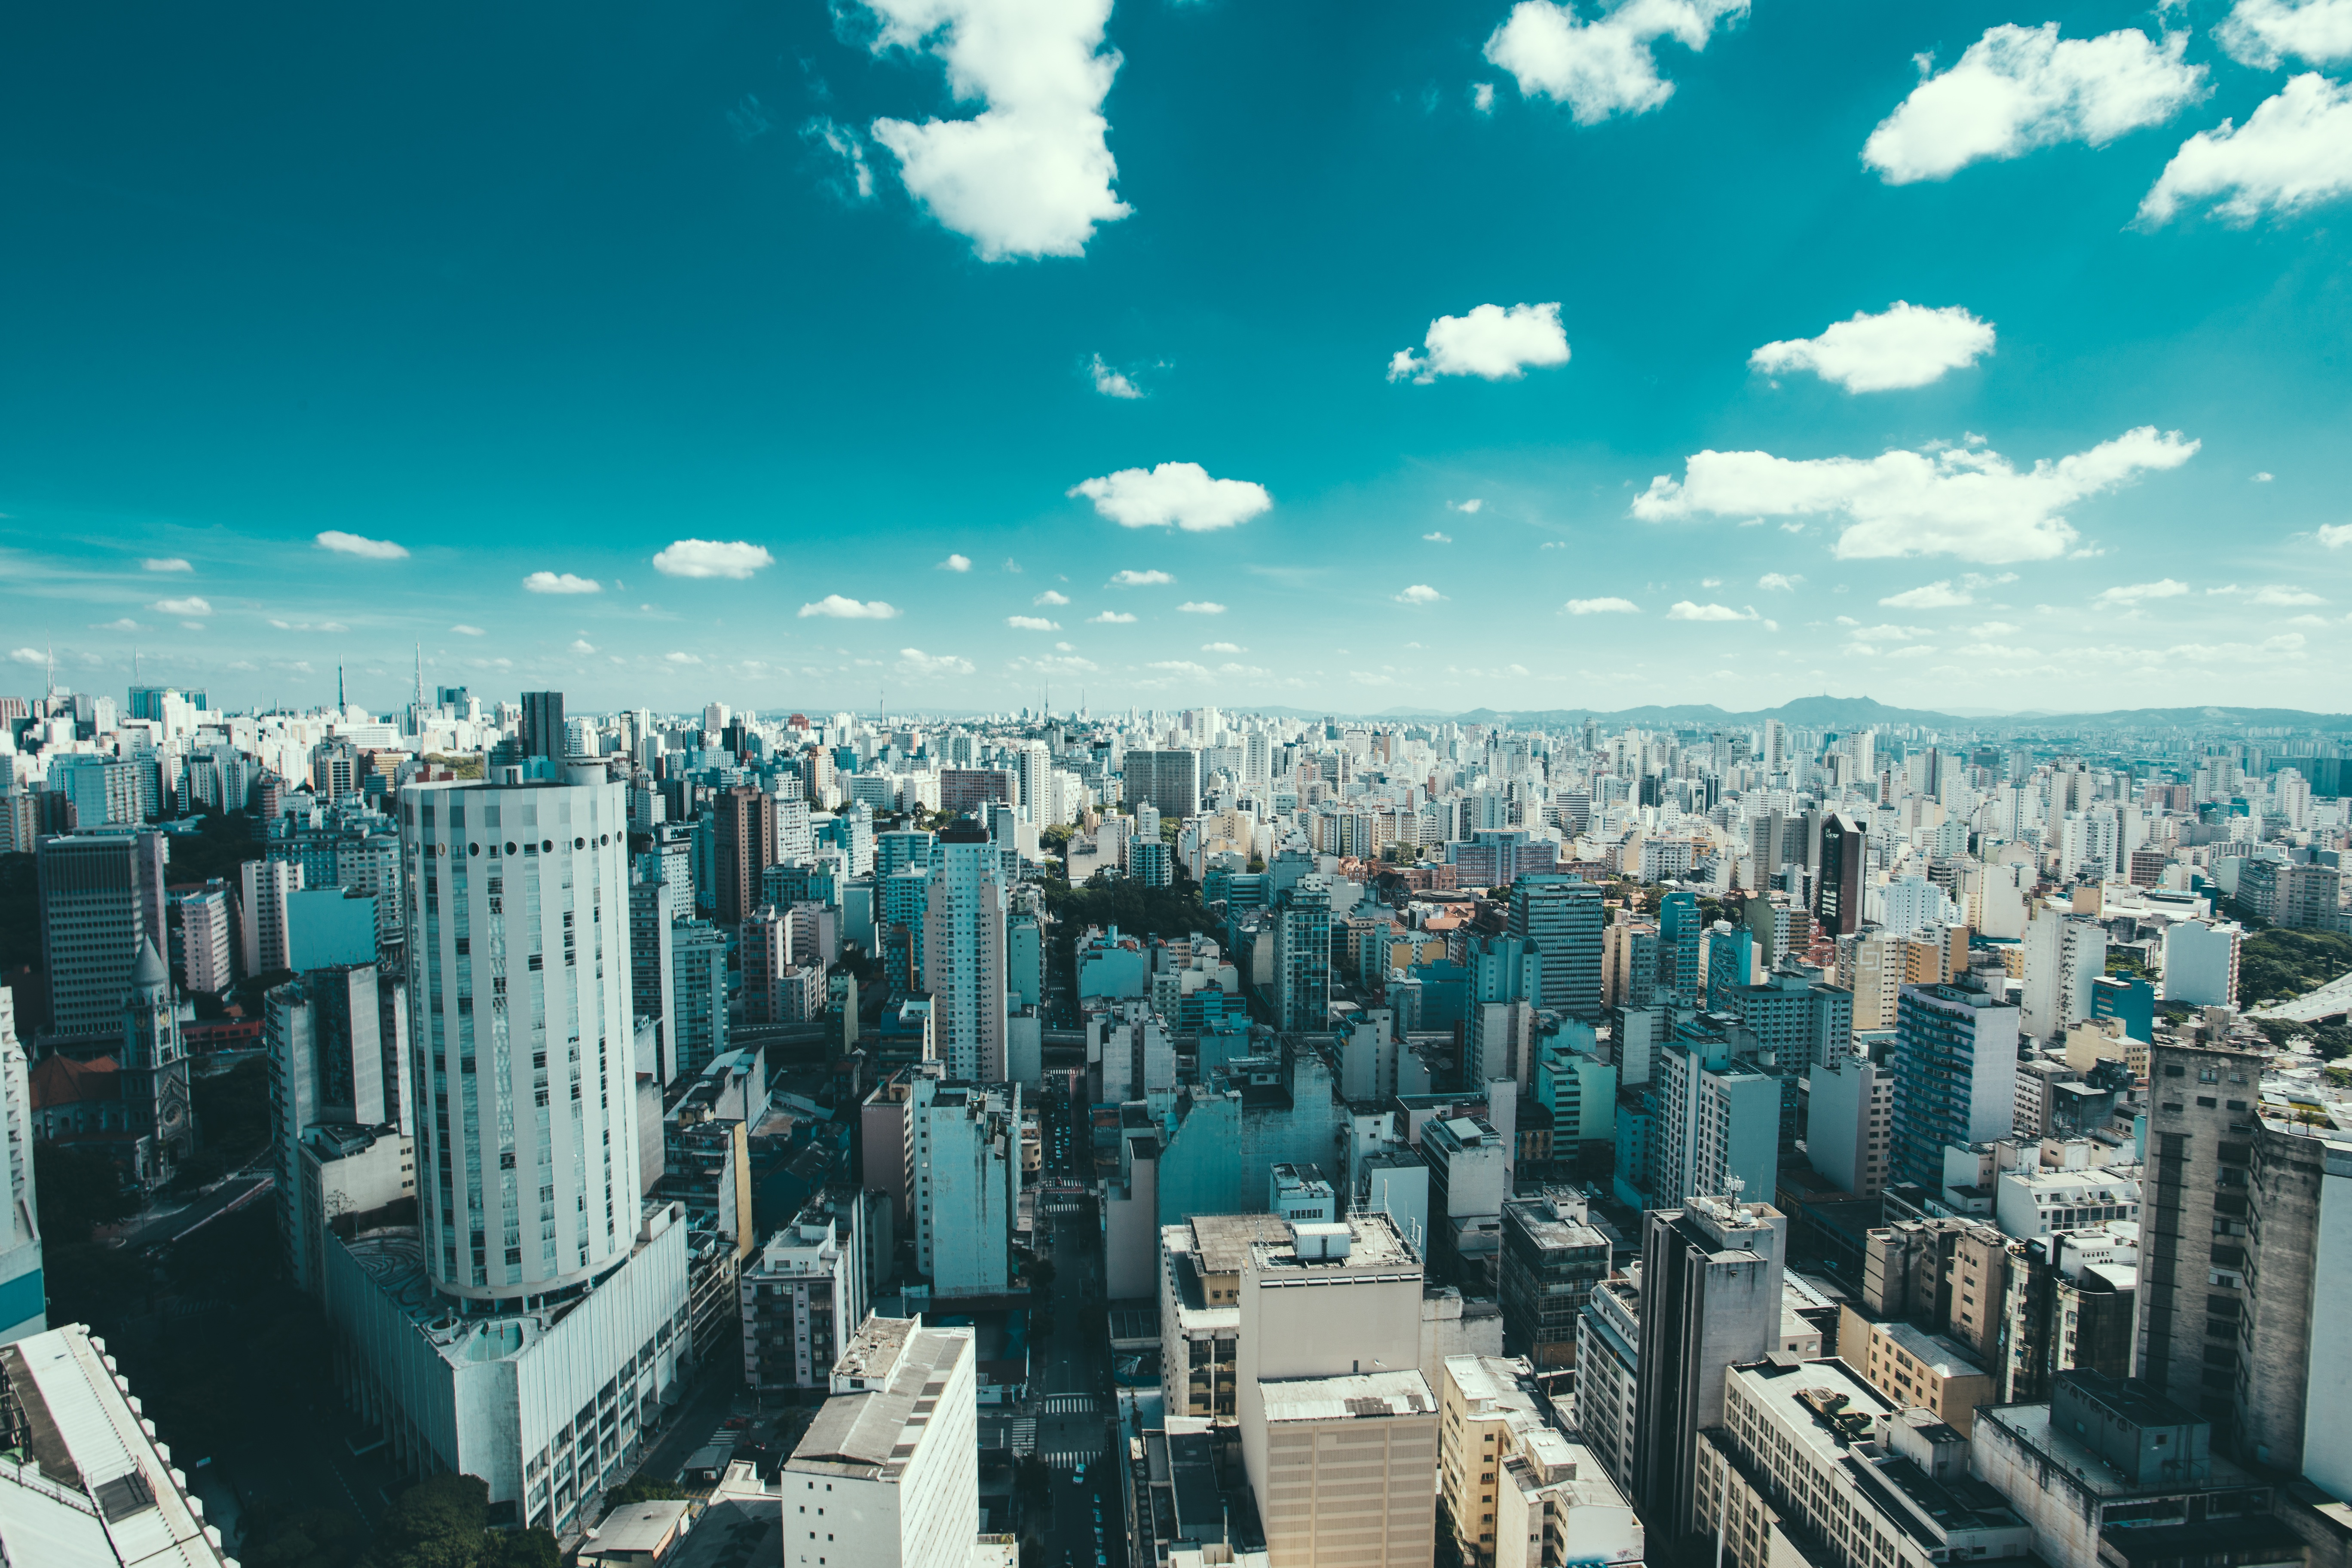 Itariri - São Paulo